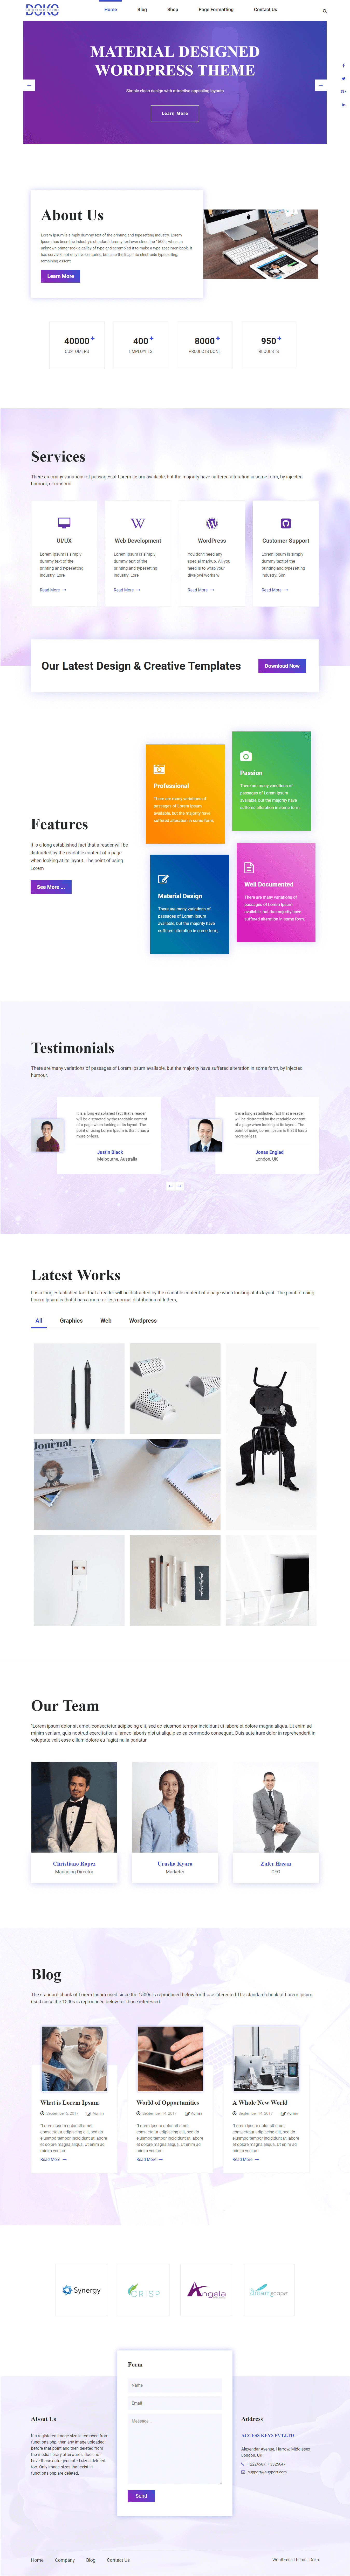 Doko - Best Free Material Design WordPress Theme